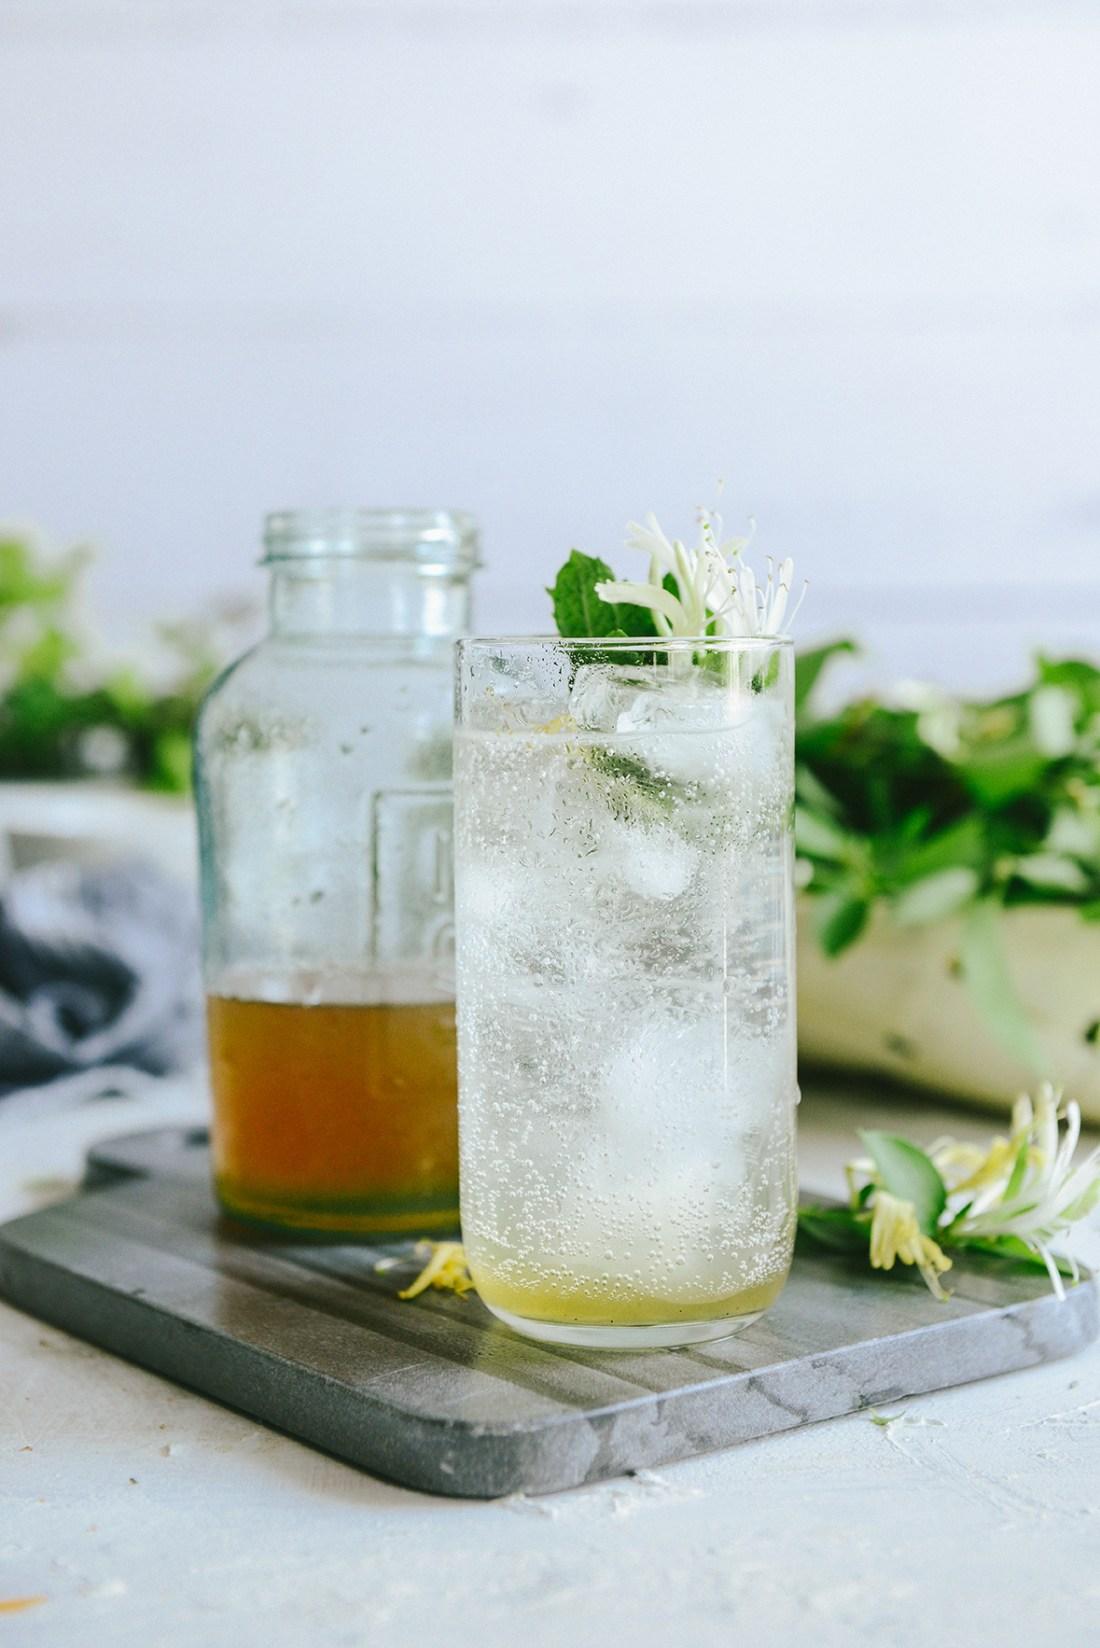 Honeysuckle Syrup for a Sparkling Spring Drink // www.WithTheGrains.com